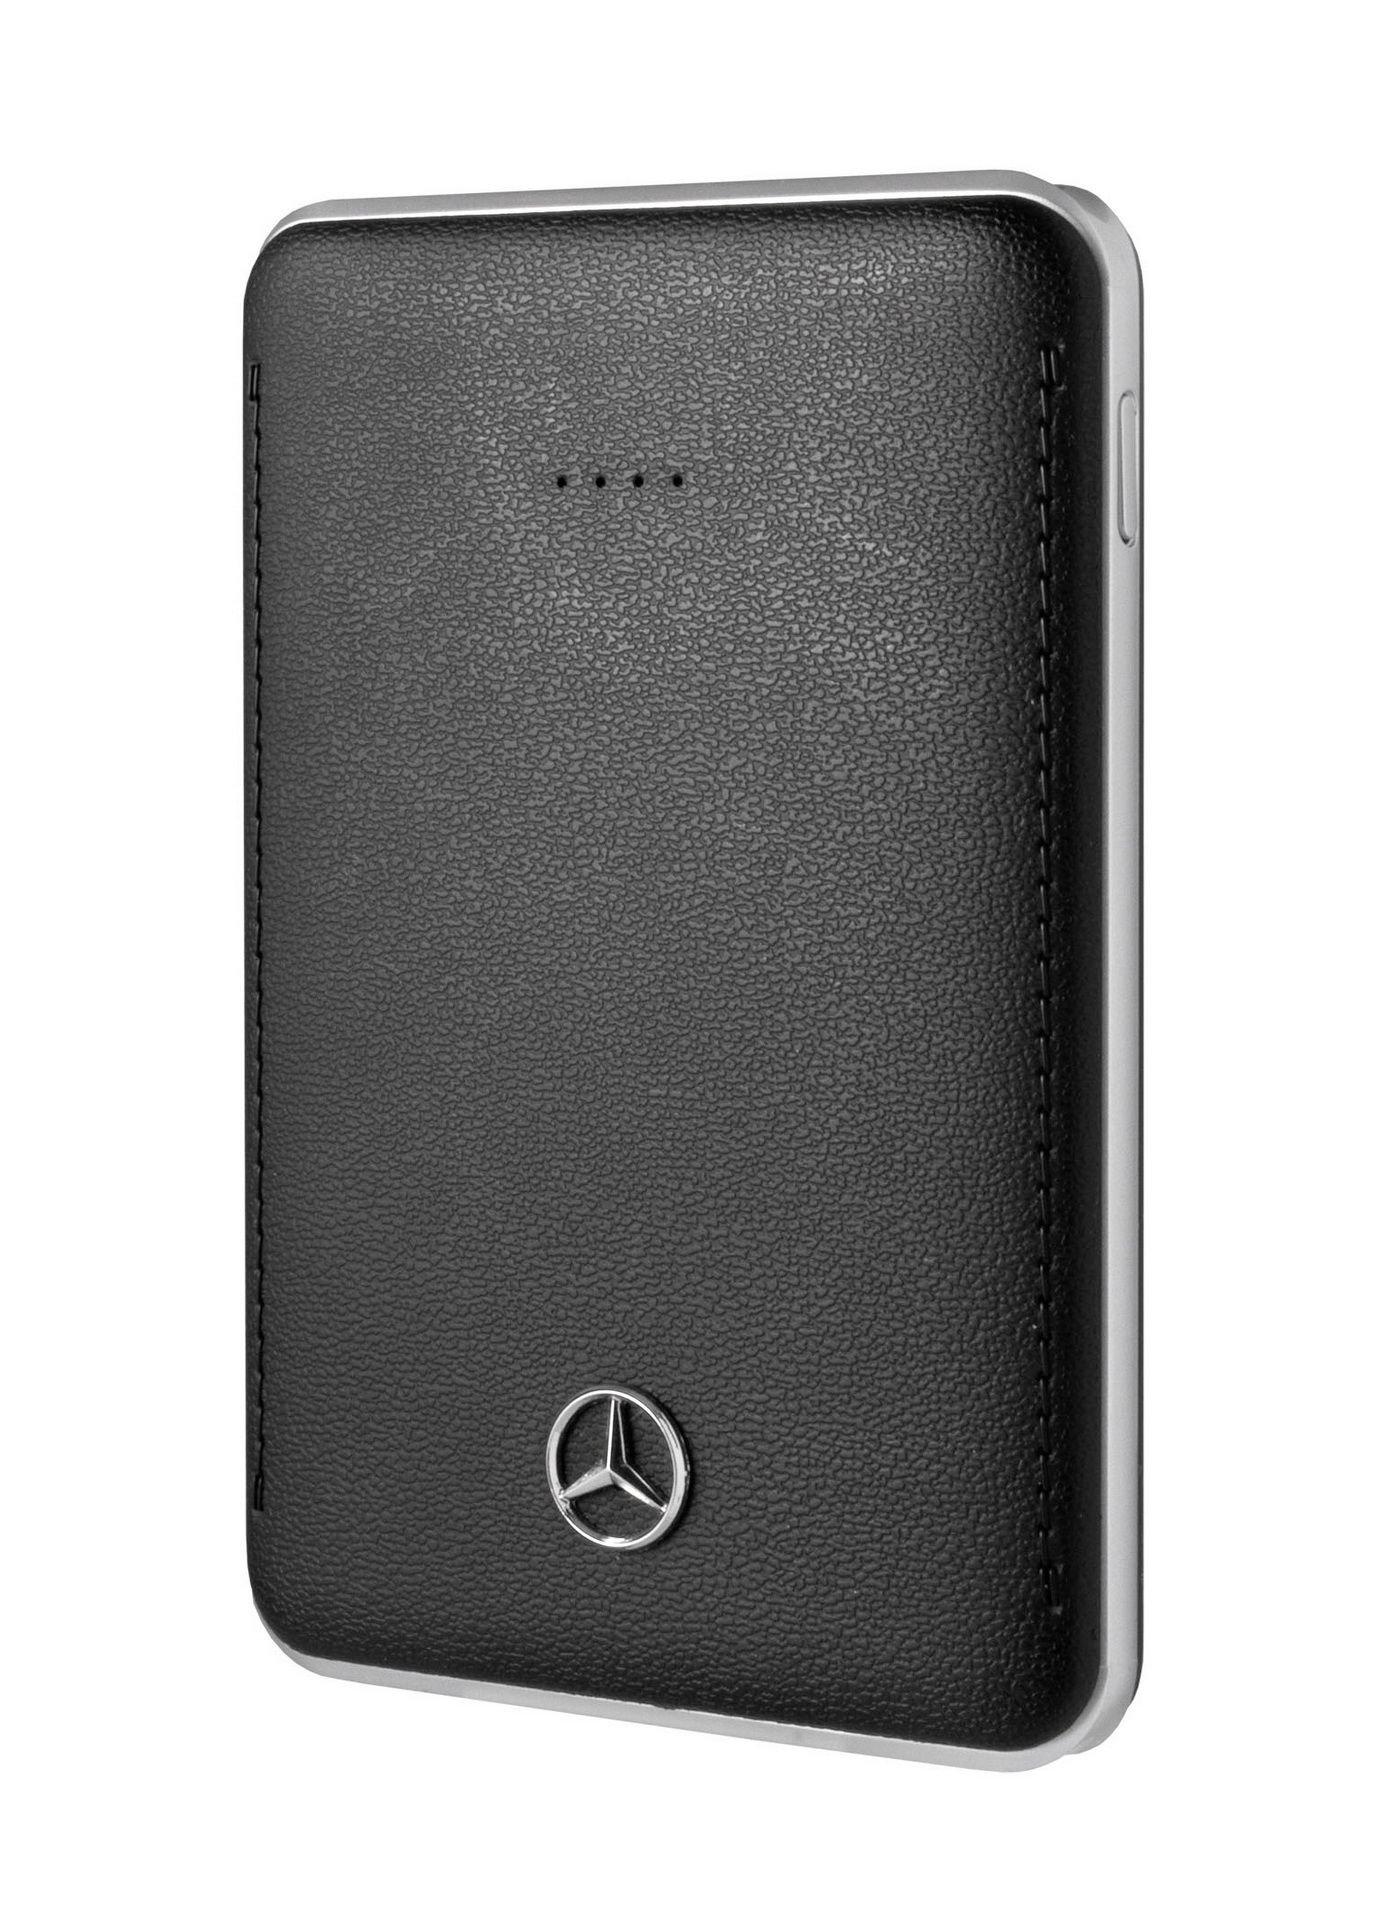 mercedes-benz-iphone-covers-14.jpg